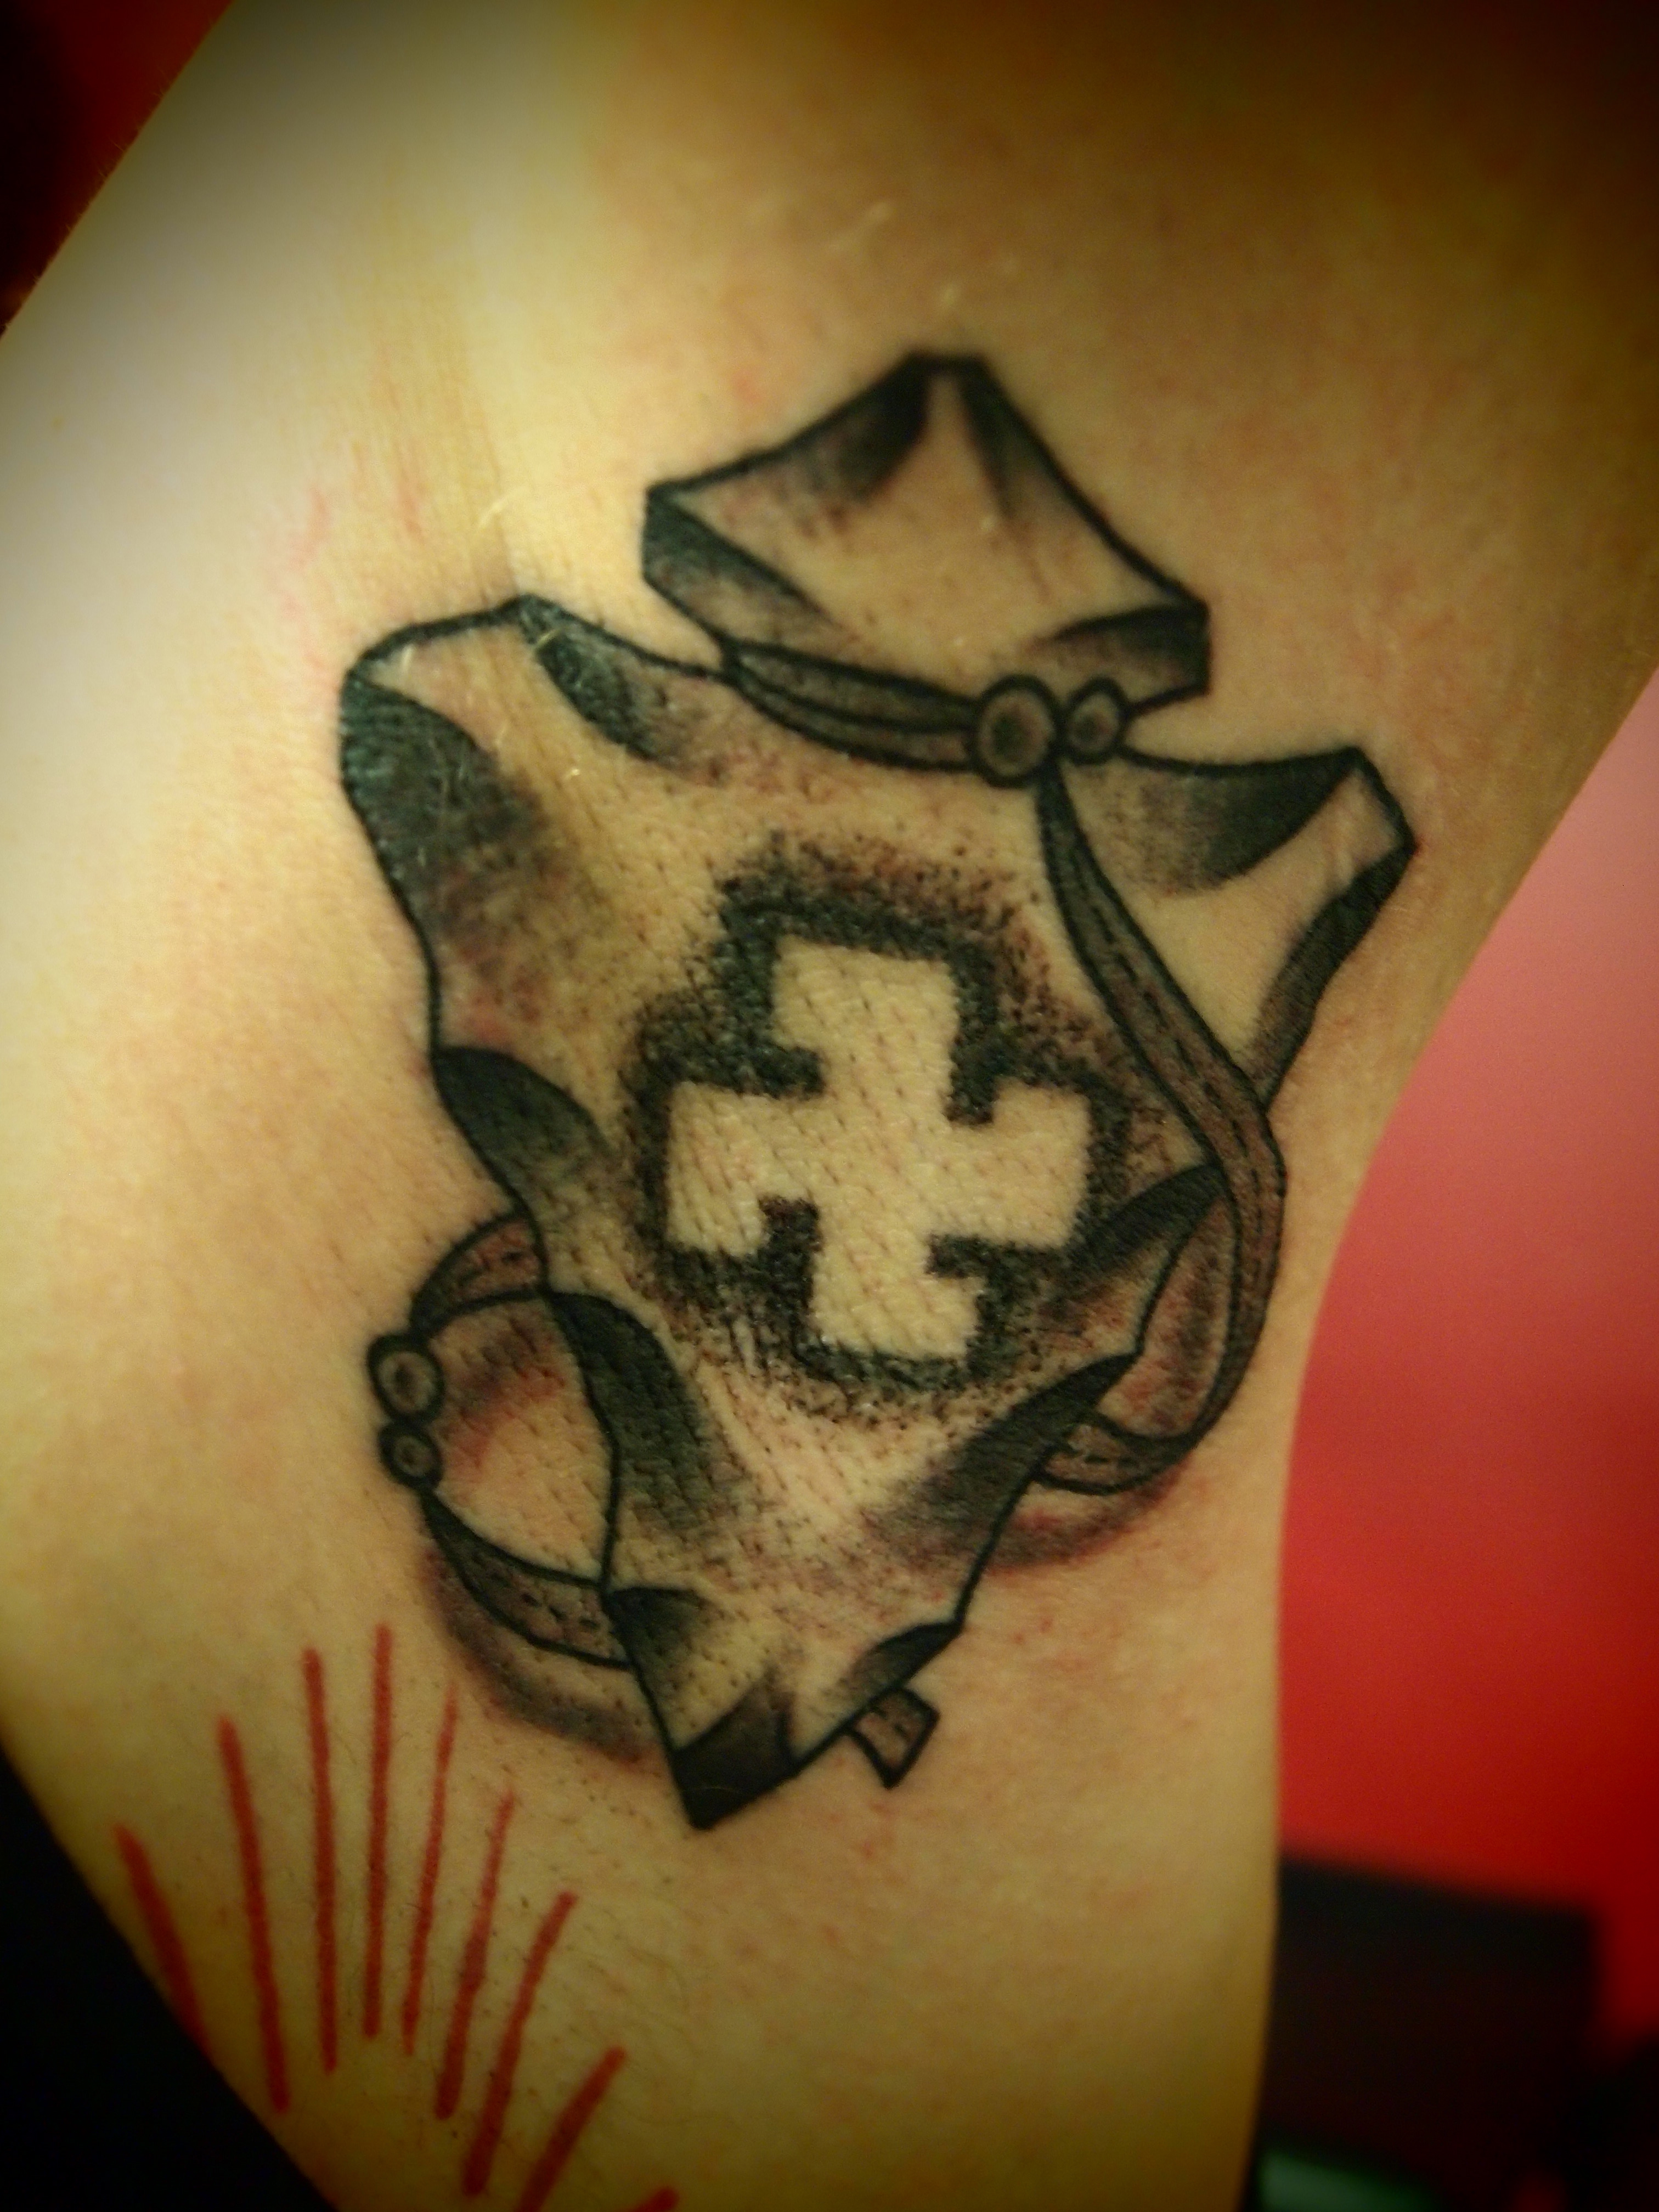 Image search: Native American Arrowhead Tattoo